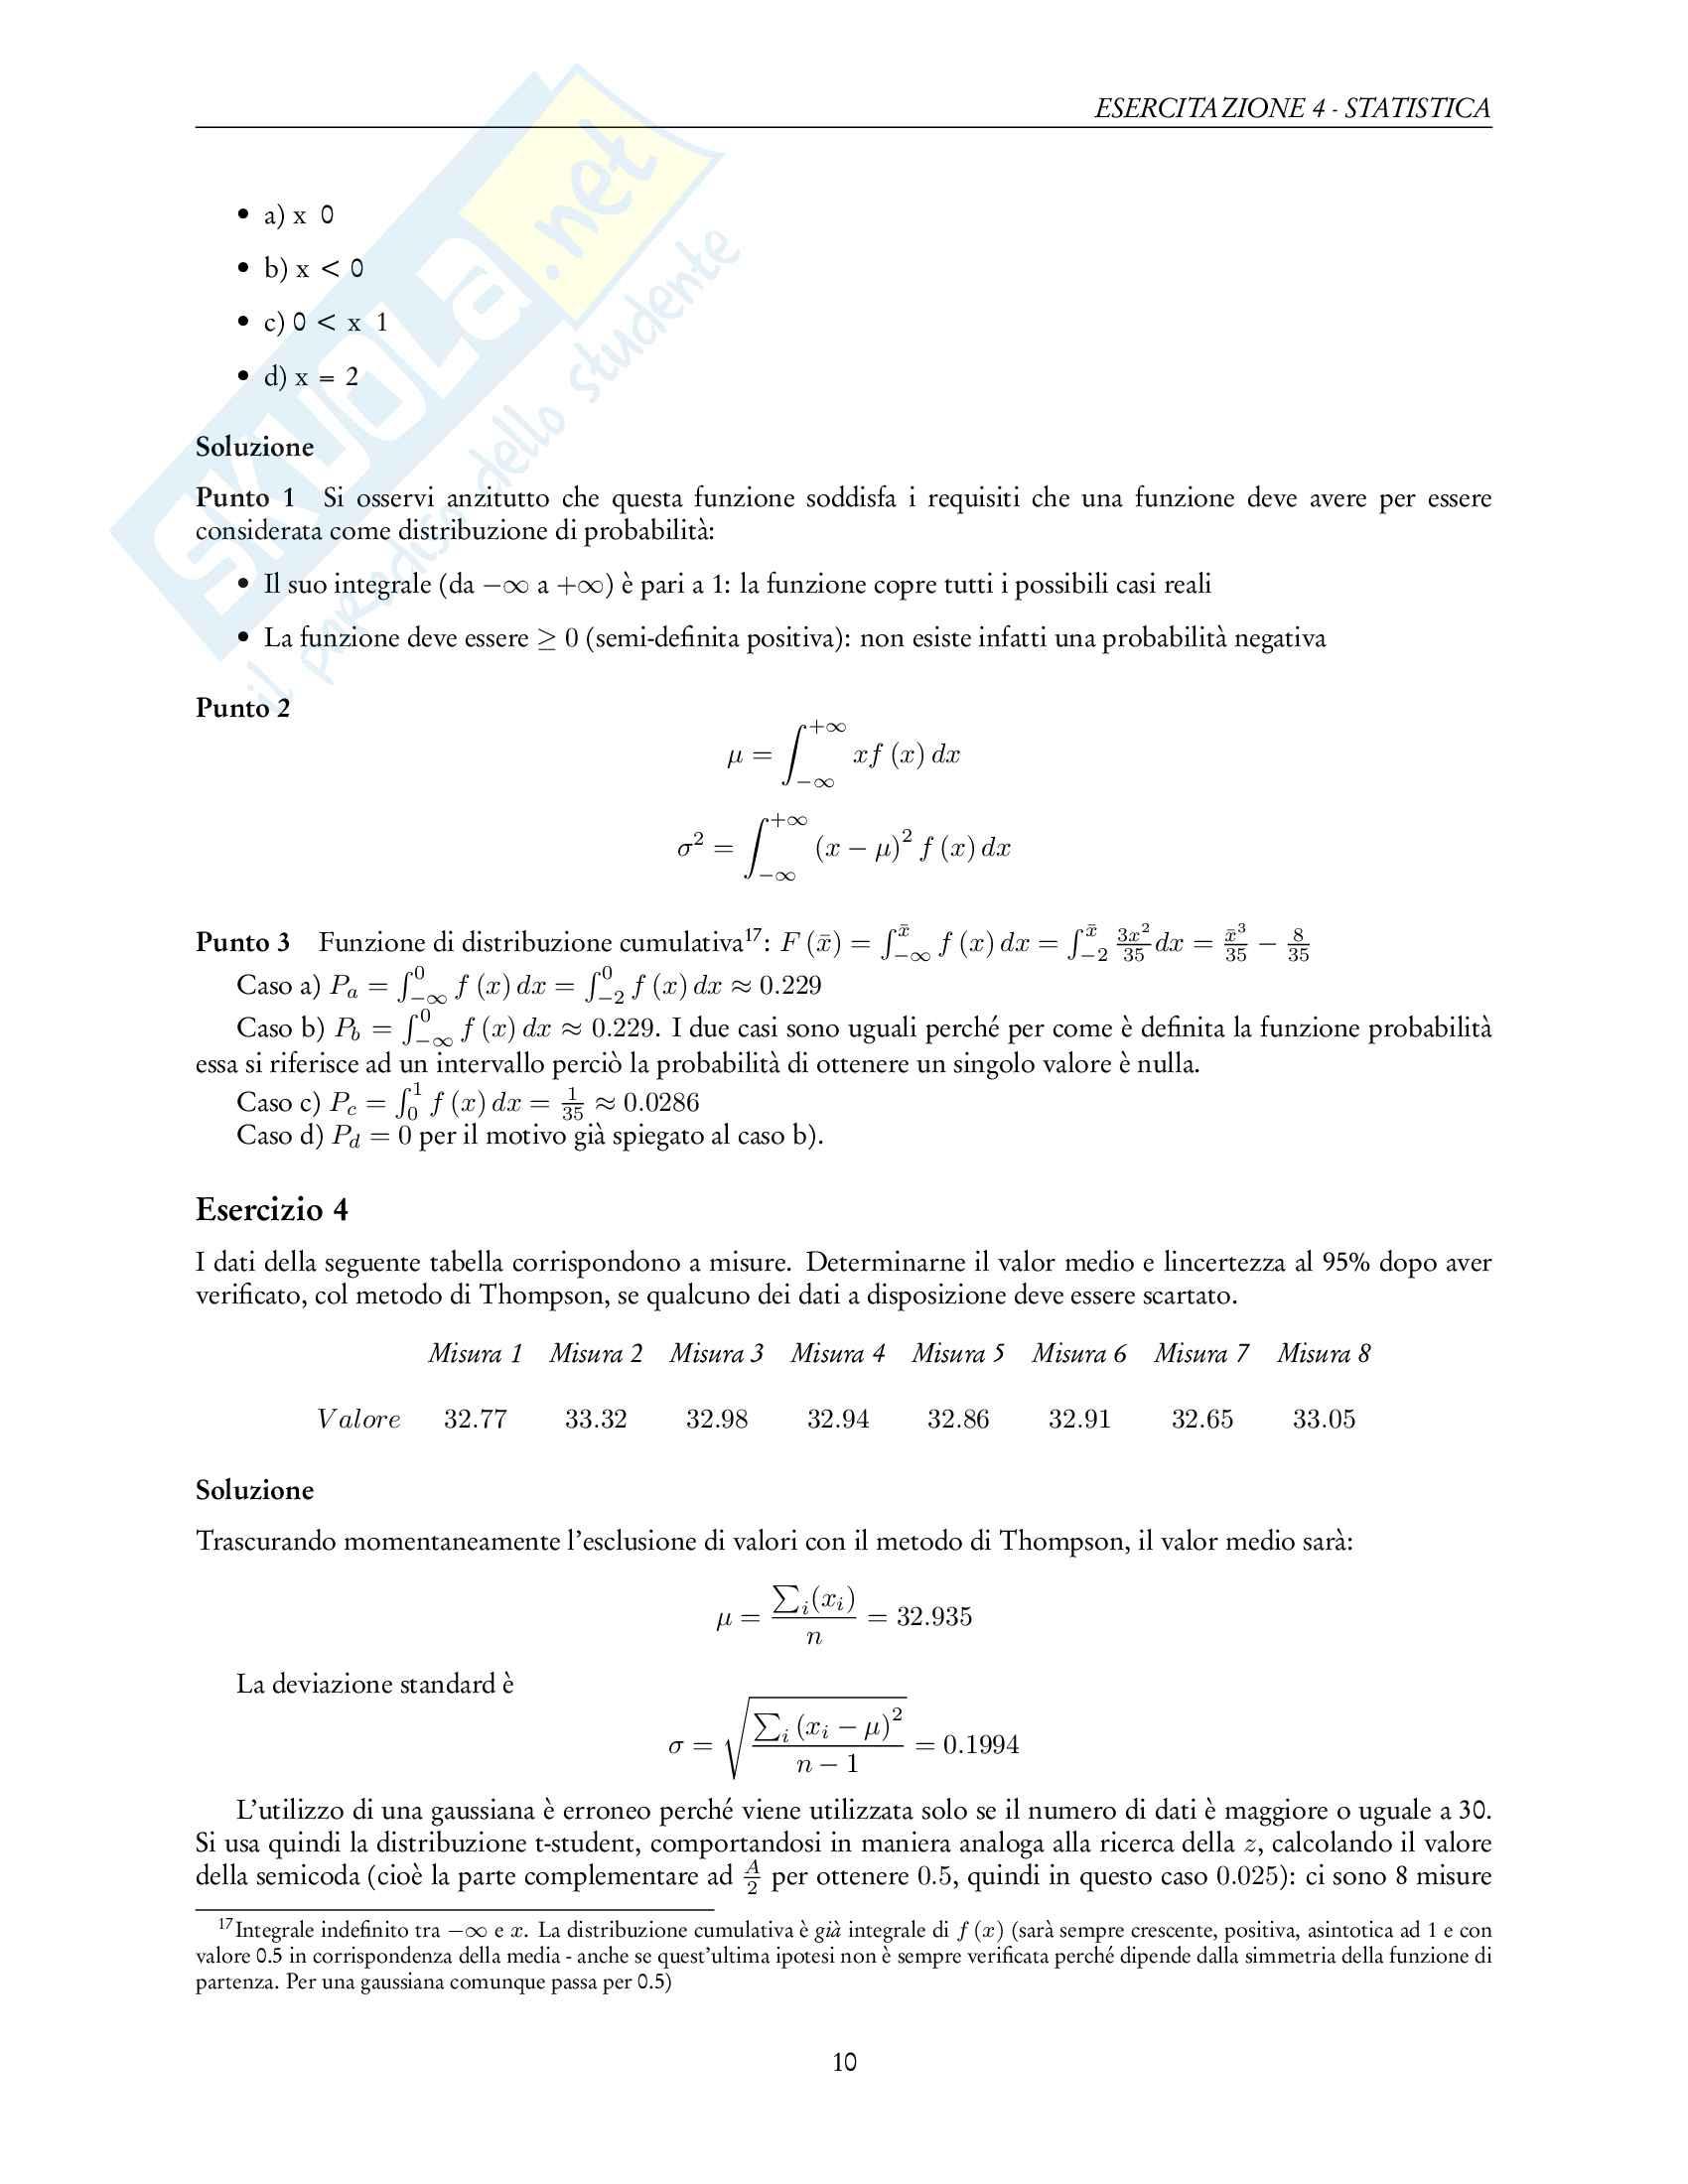 Esercitazioni di Sperimentazione Aerospaziale Pag. 11